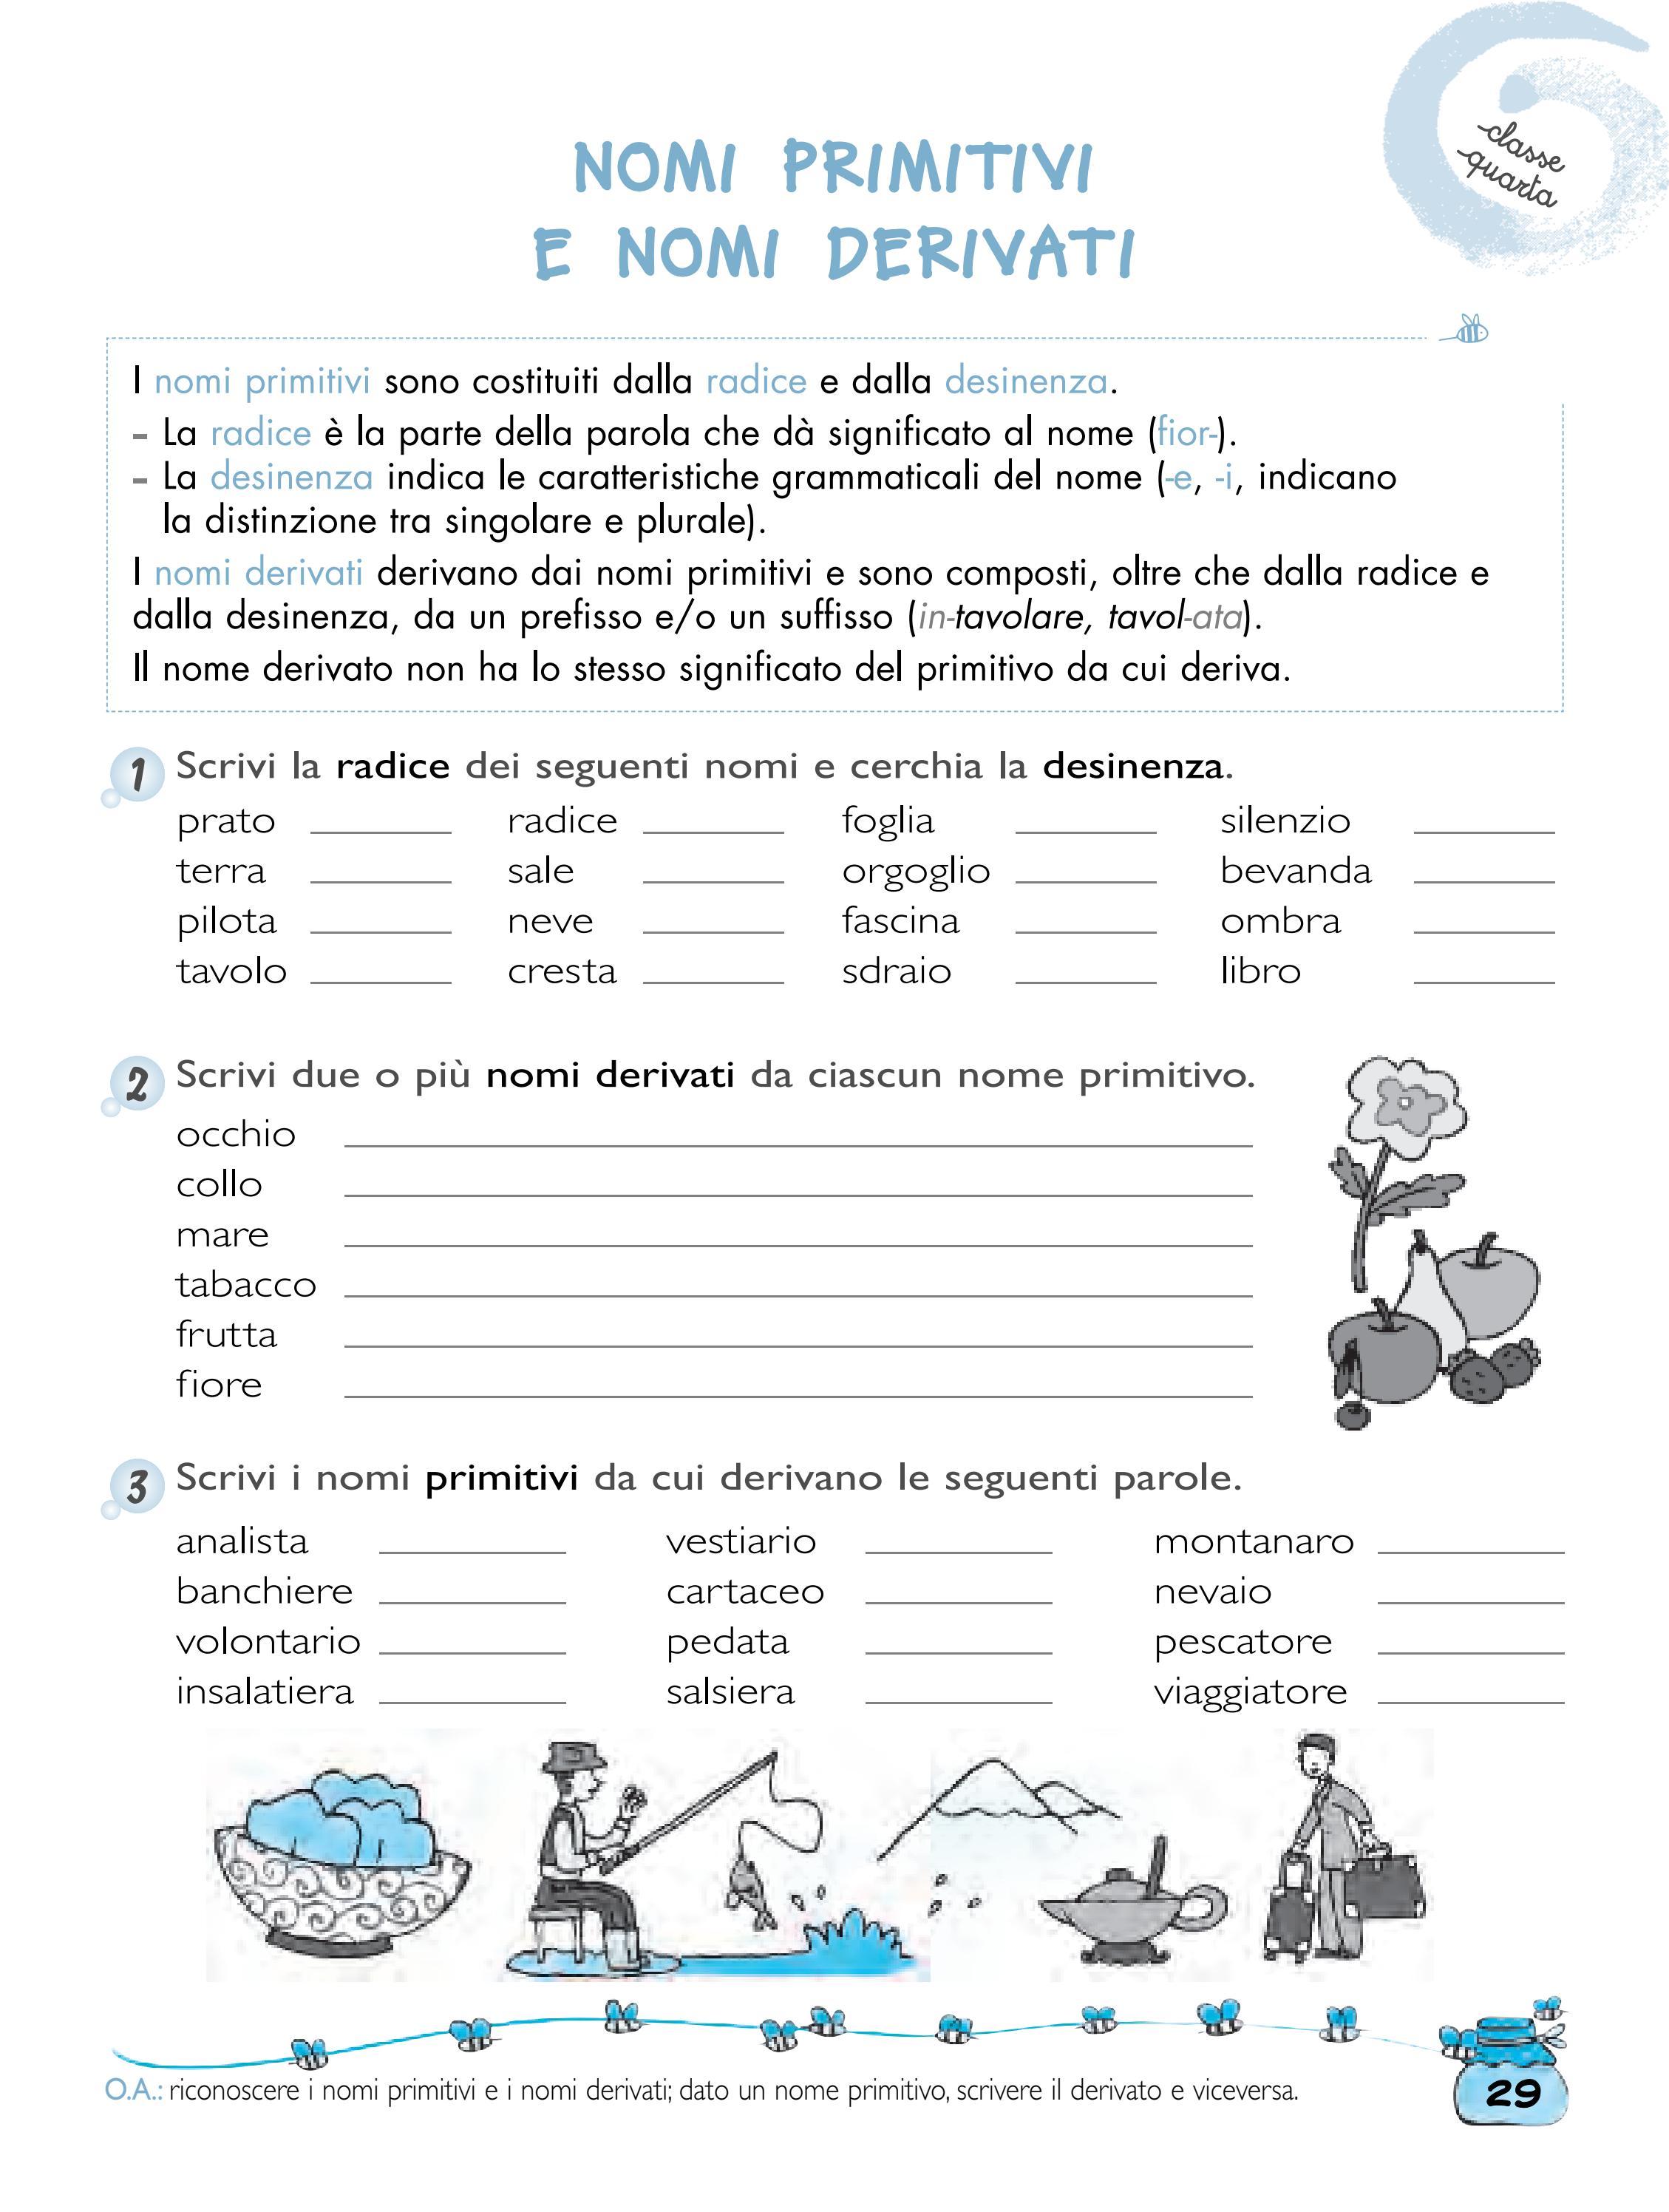 magicamente lab grammatica 4 5 by elvira ussia page 30